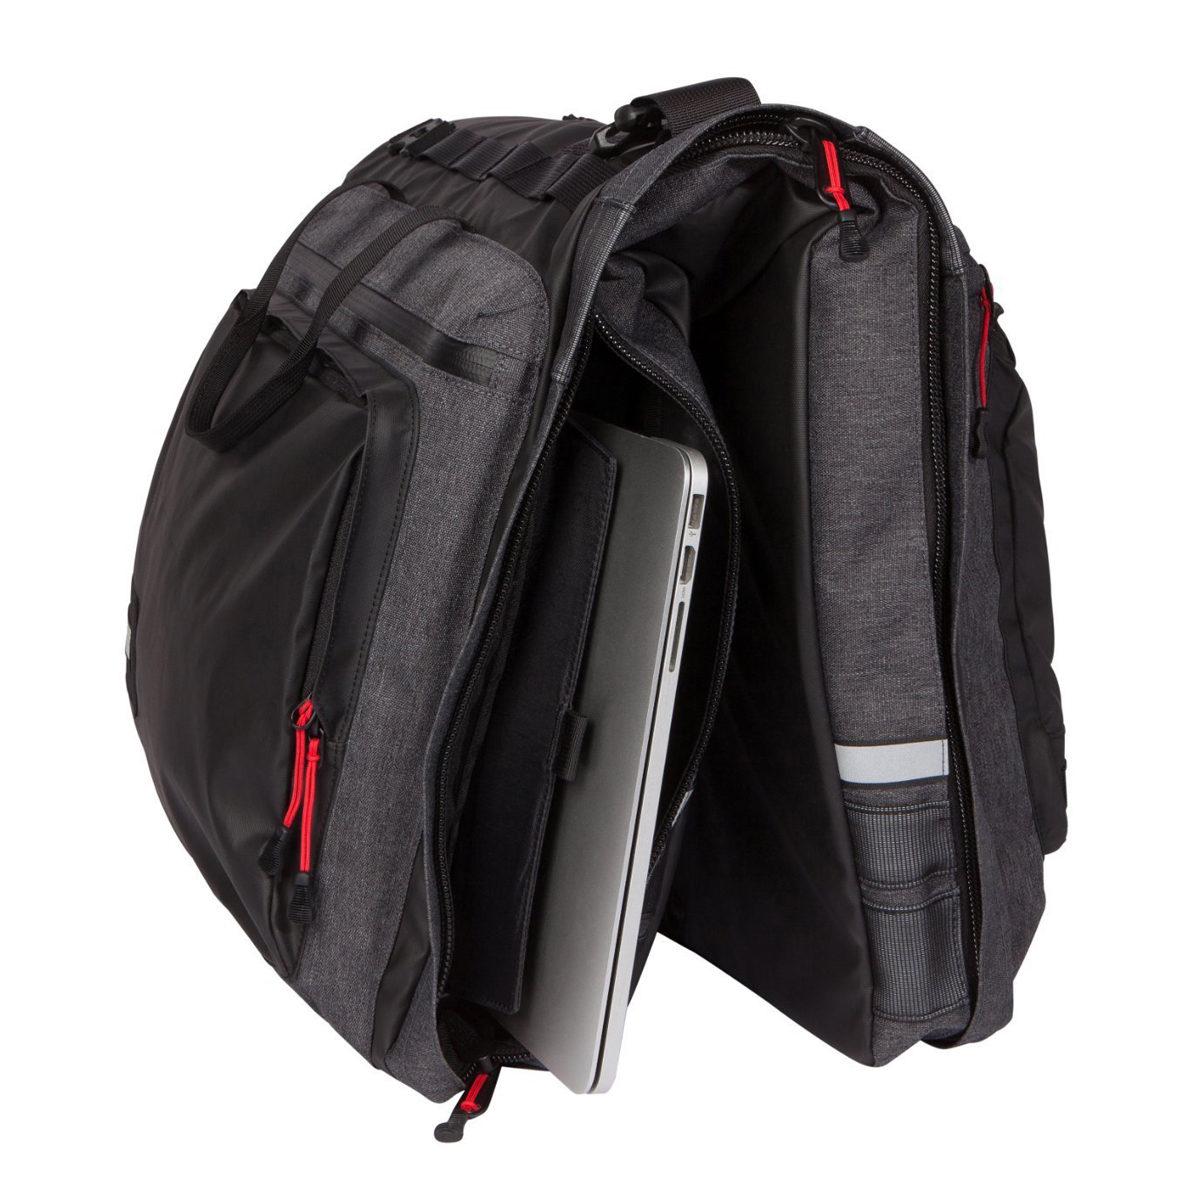 Classic 3.0 Garment Pannier – Graphite Grey 1